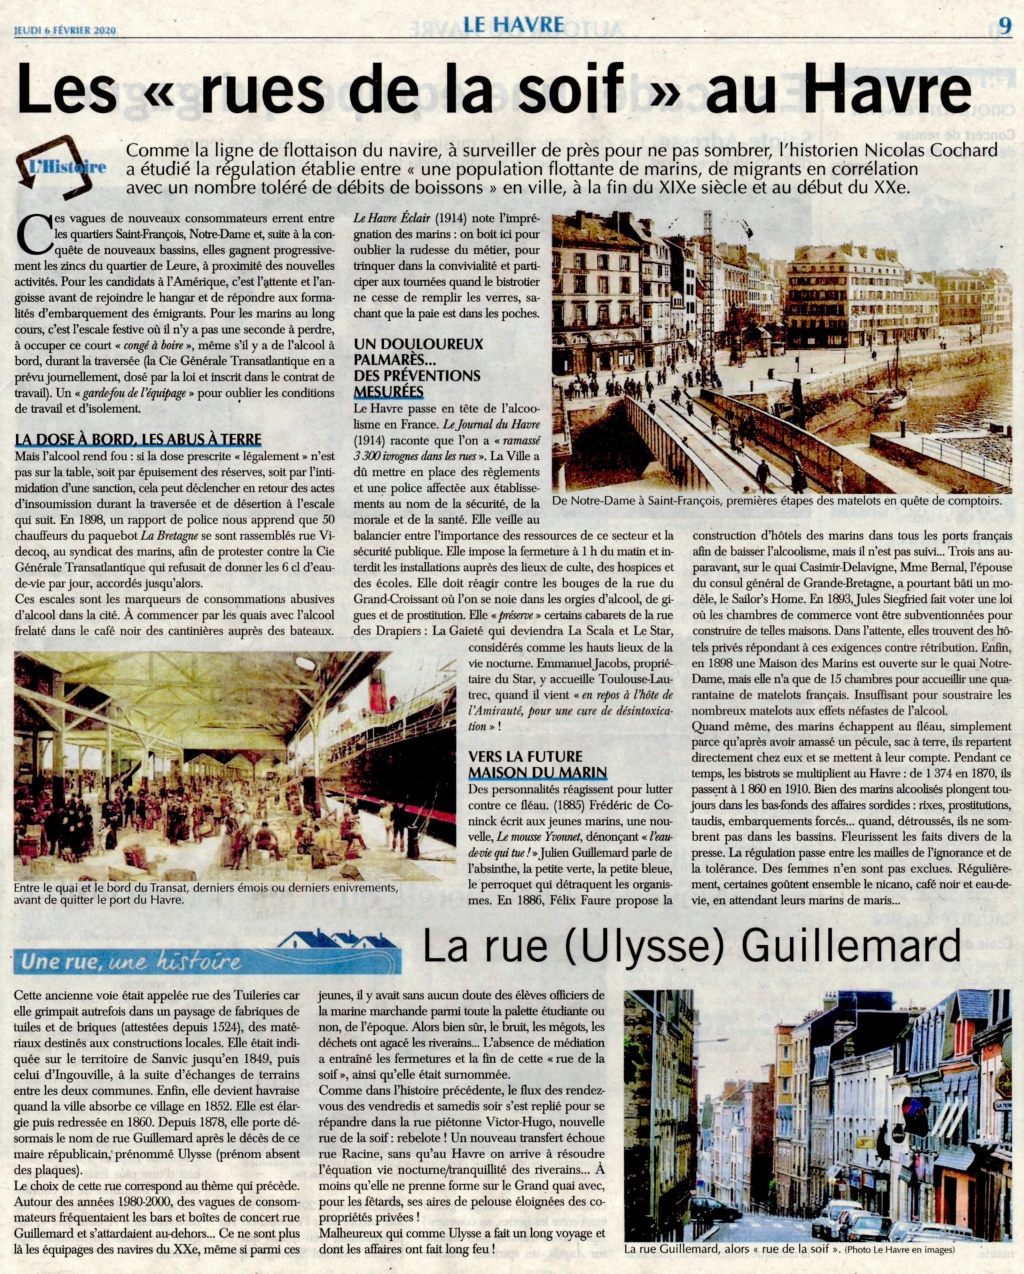 Le Havre - Rue Guillemard 2020-015